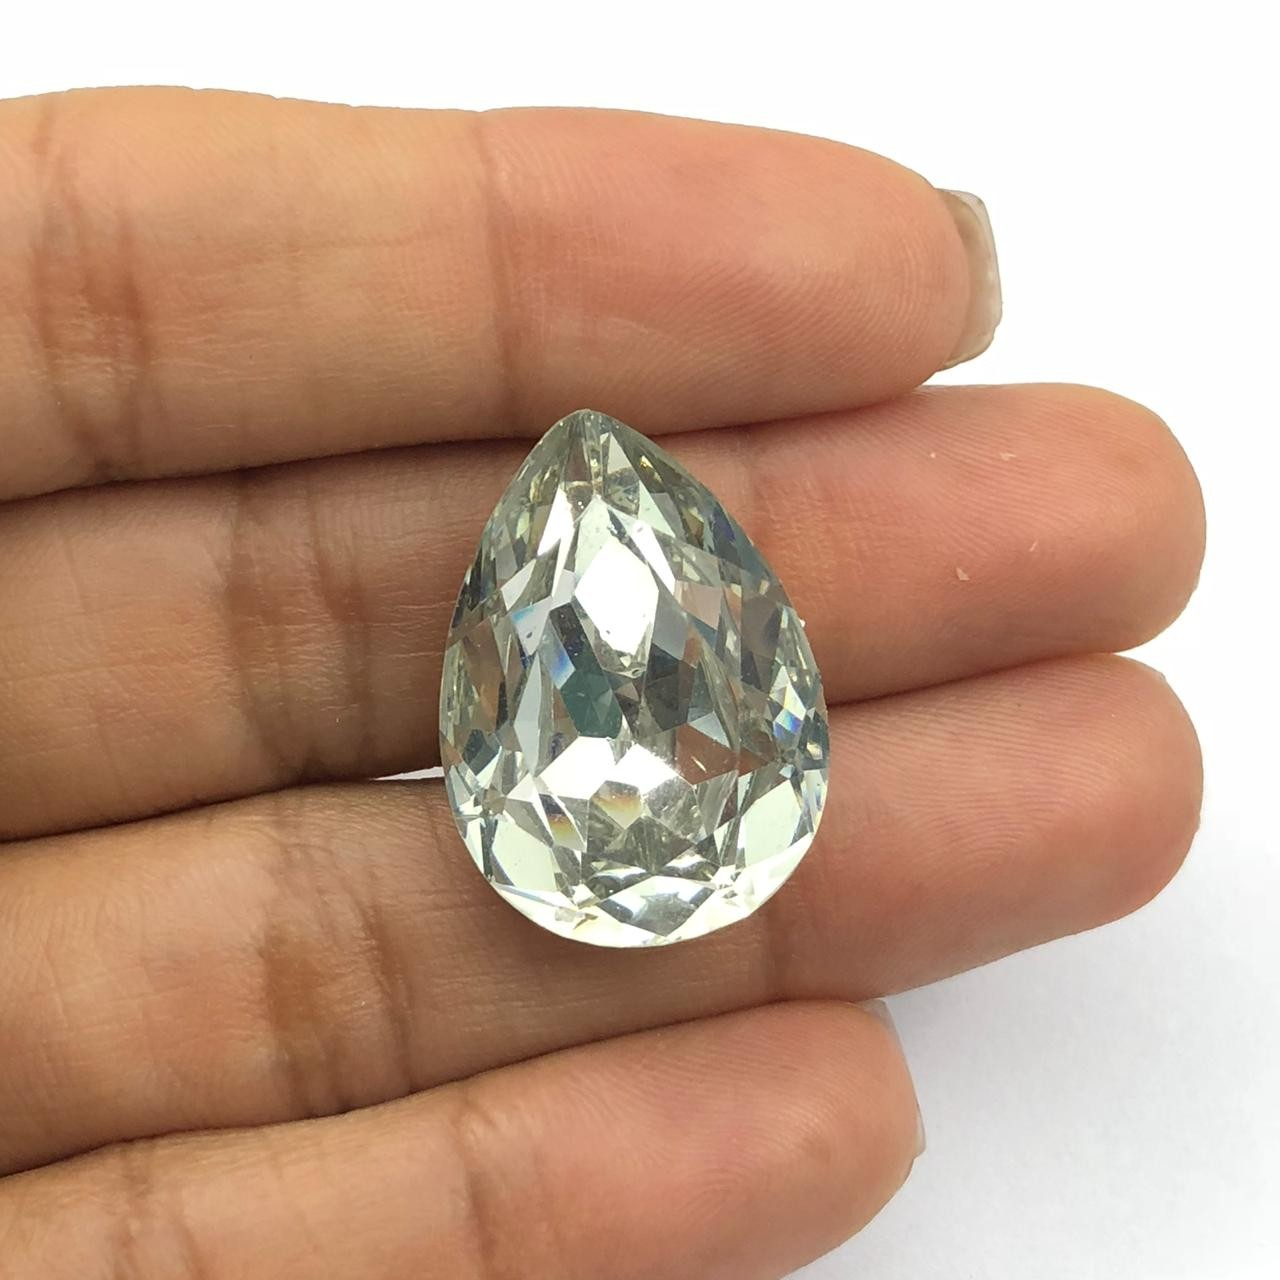 CHT645 - Chaton Gota 18x25 Base Côncava Cristal - 2unids